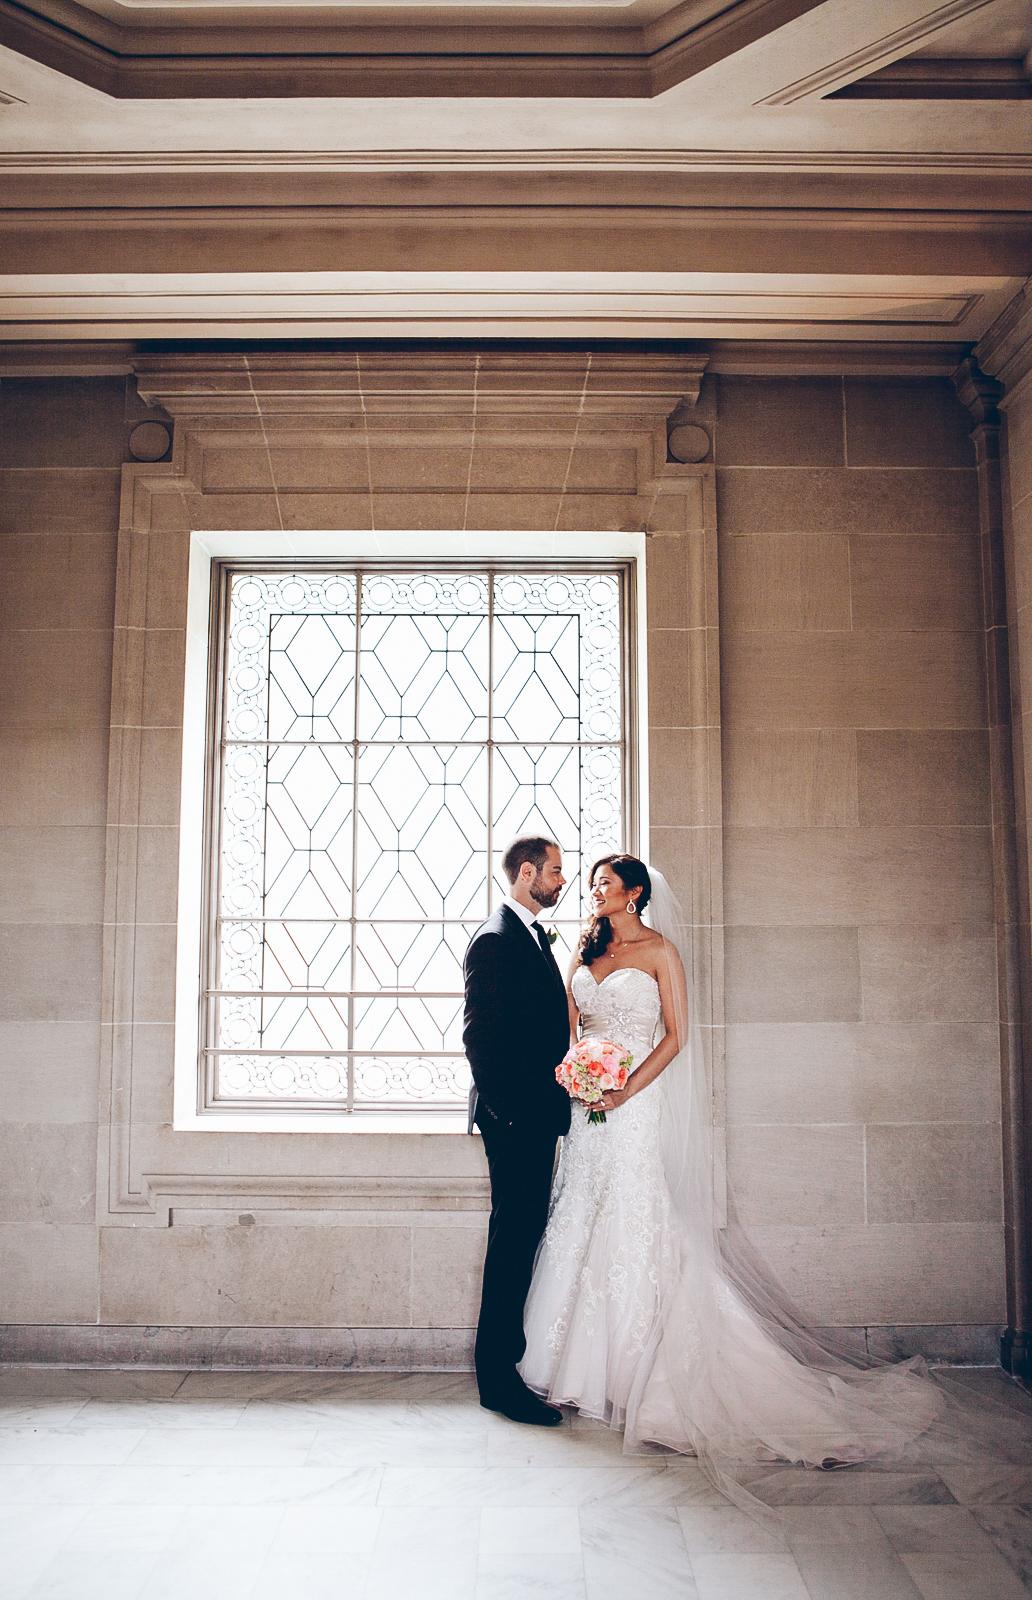 San_francisco_city_hall_wedding_photography_meegan_travis_ebony_siovhan_bokeh_photography_45.jpg